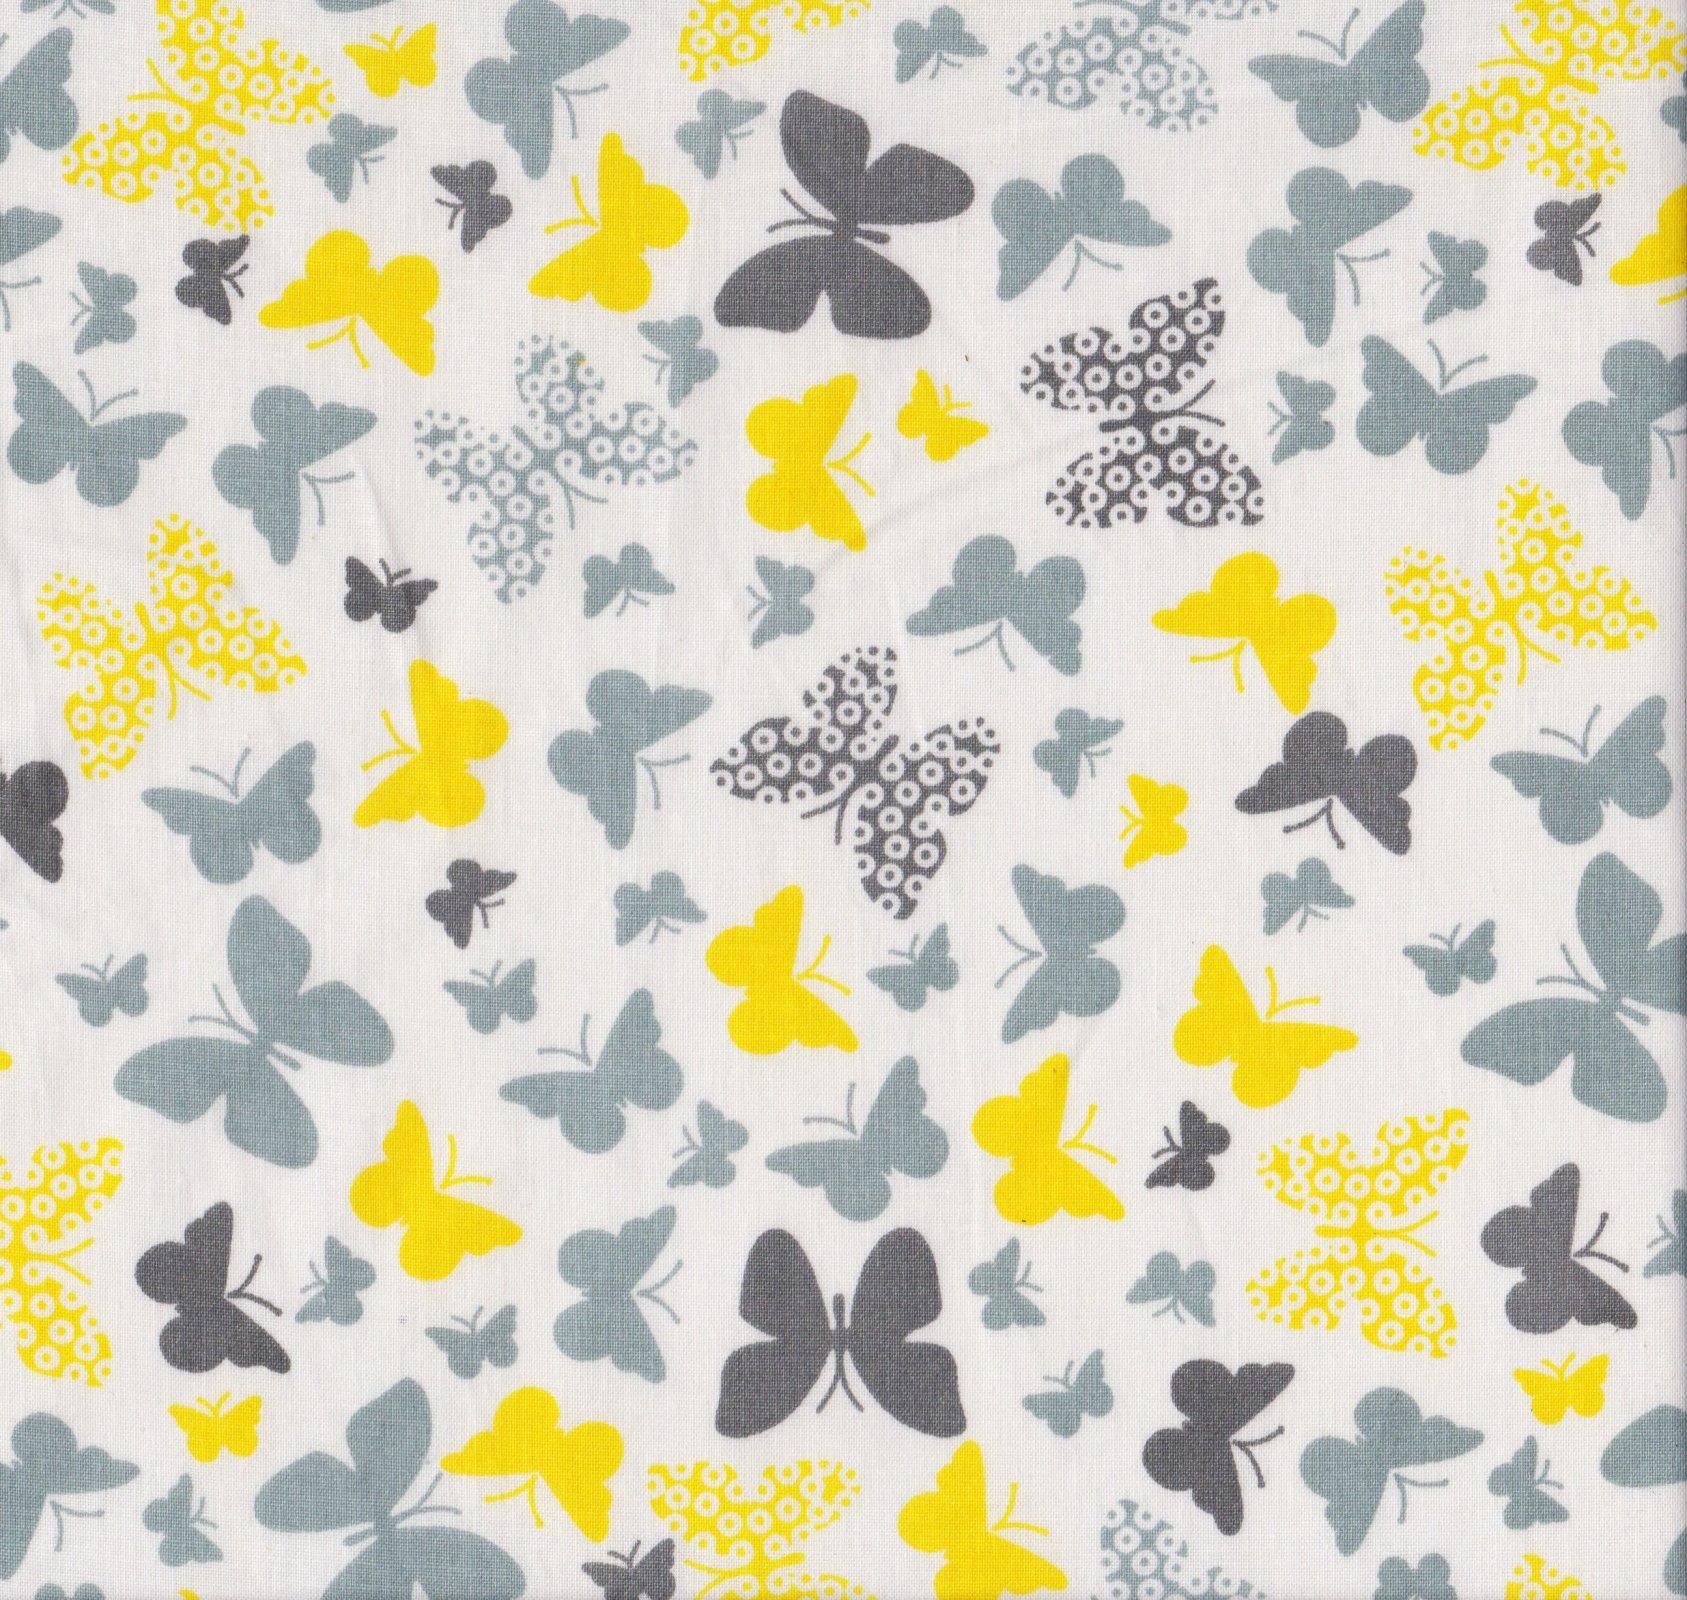 PROMO* FT-Novelty Prints - Yellow & Grey Butterflies